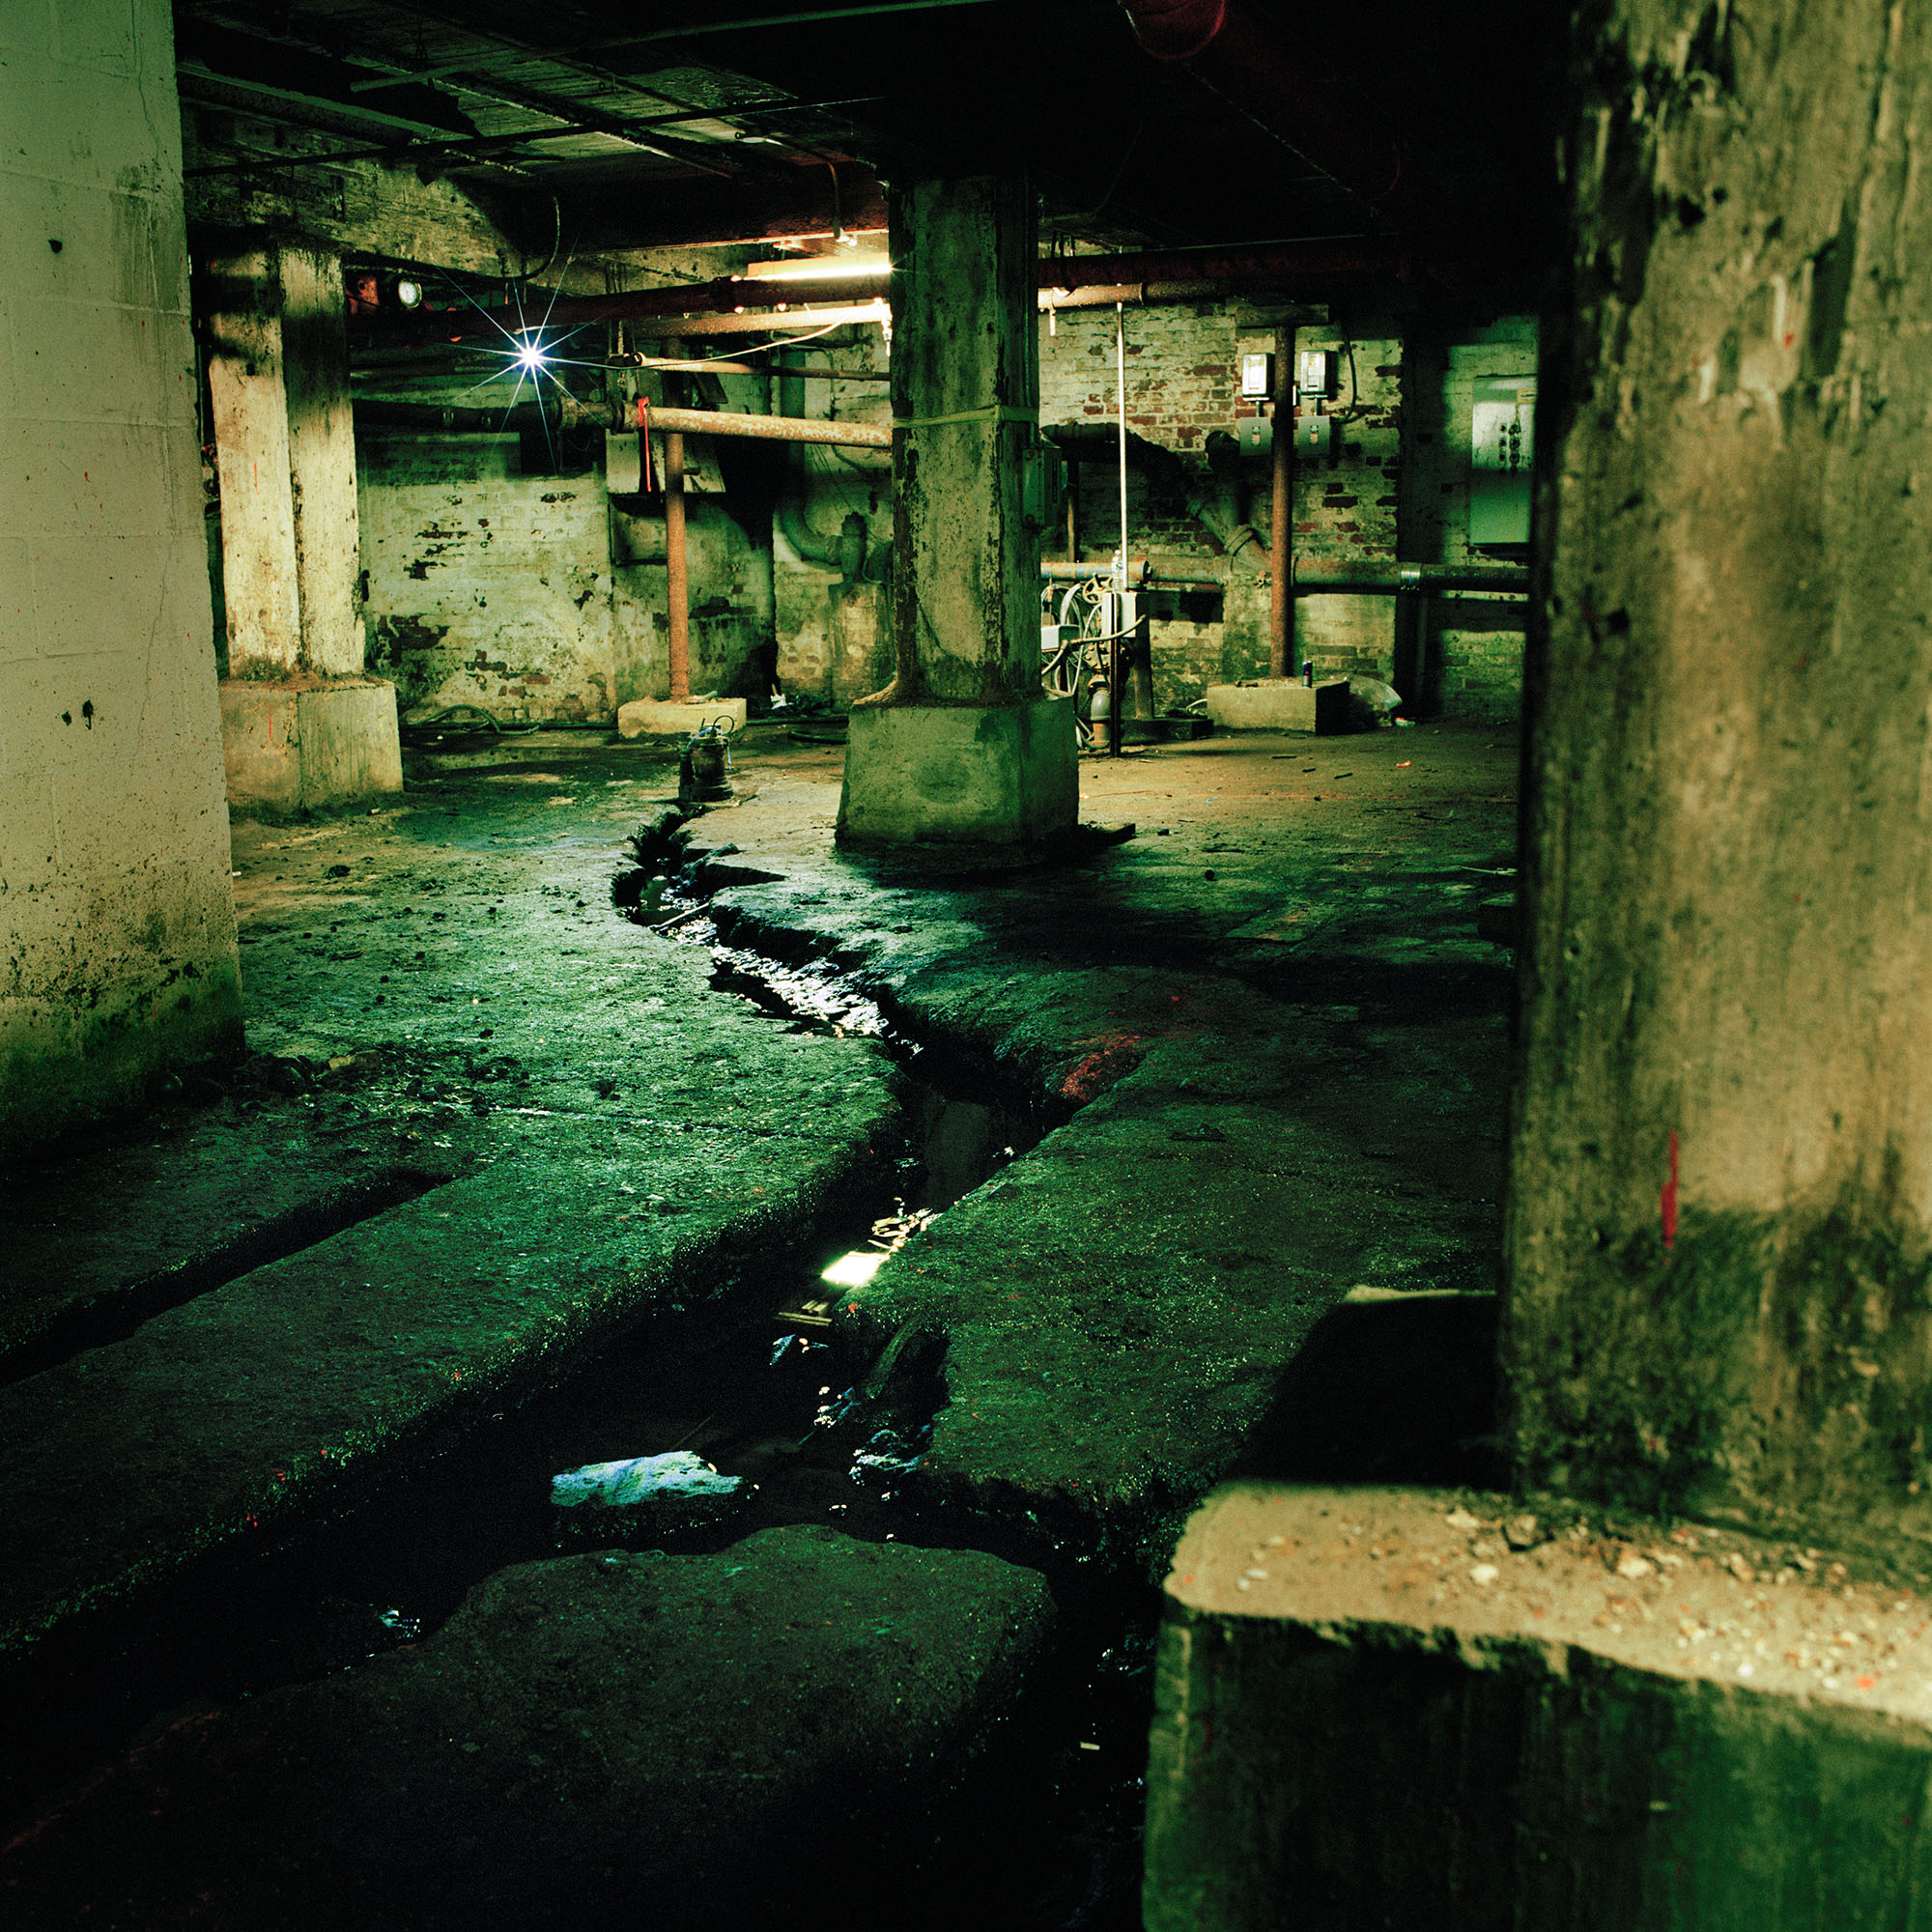 union_basement_01_2000.jpg